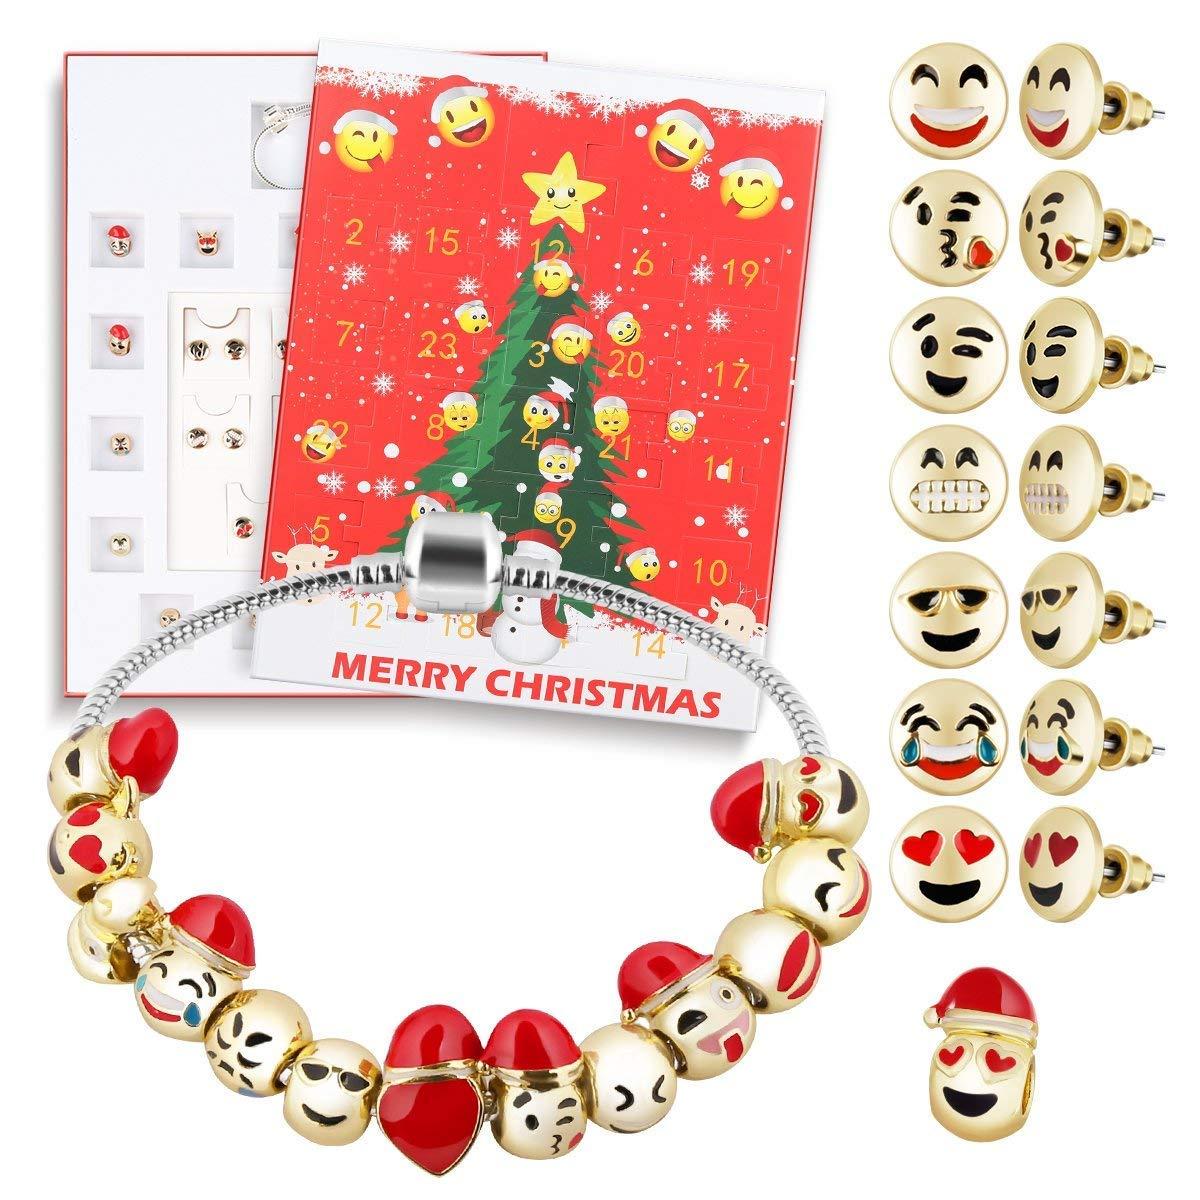 Sopear Adventskalender, Cute Christmas Advent Countdown Kalender DIY 24 Tage Charms Armband Emoji Perlen Ohrstecker Set Ü berraschungsbox fü r Mä dchen Frauen